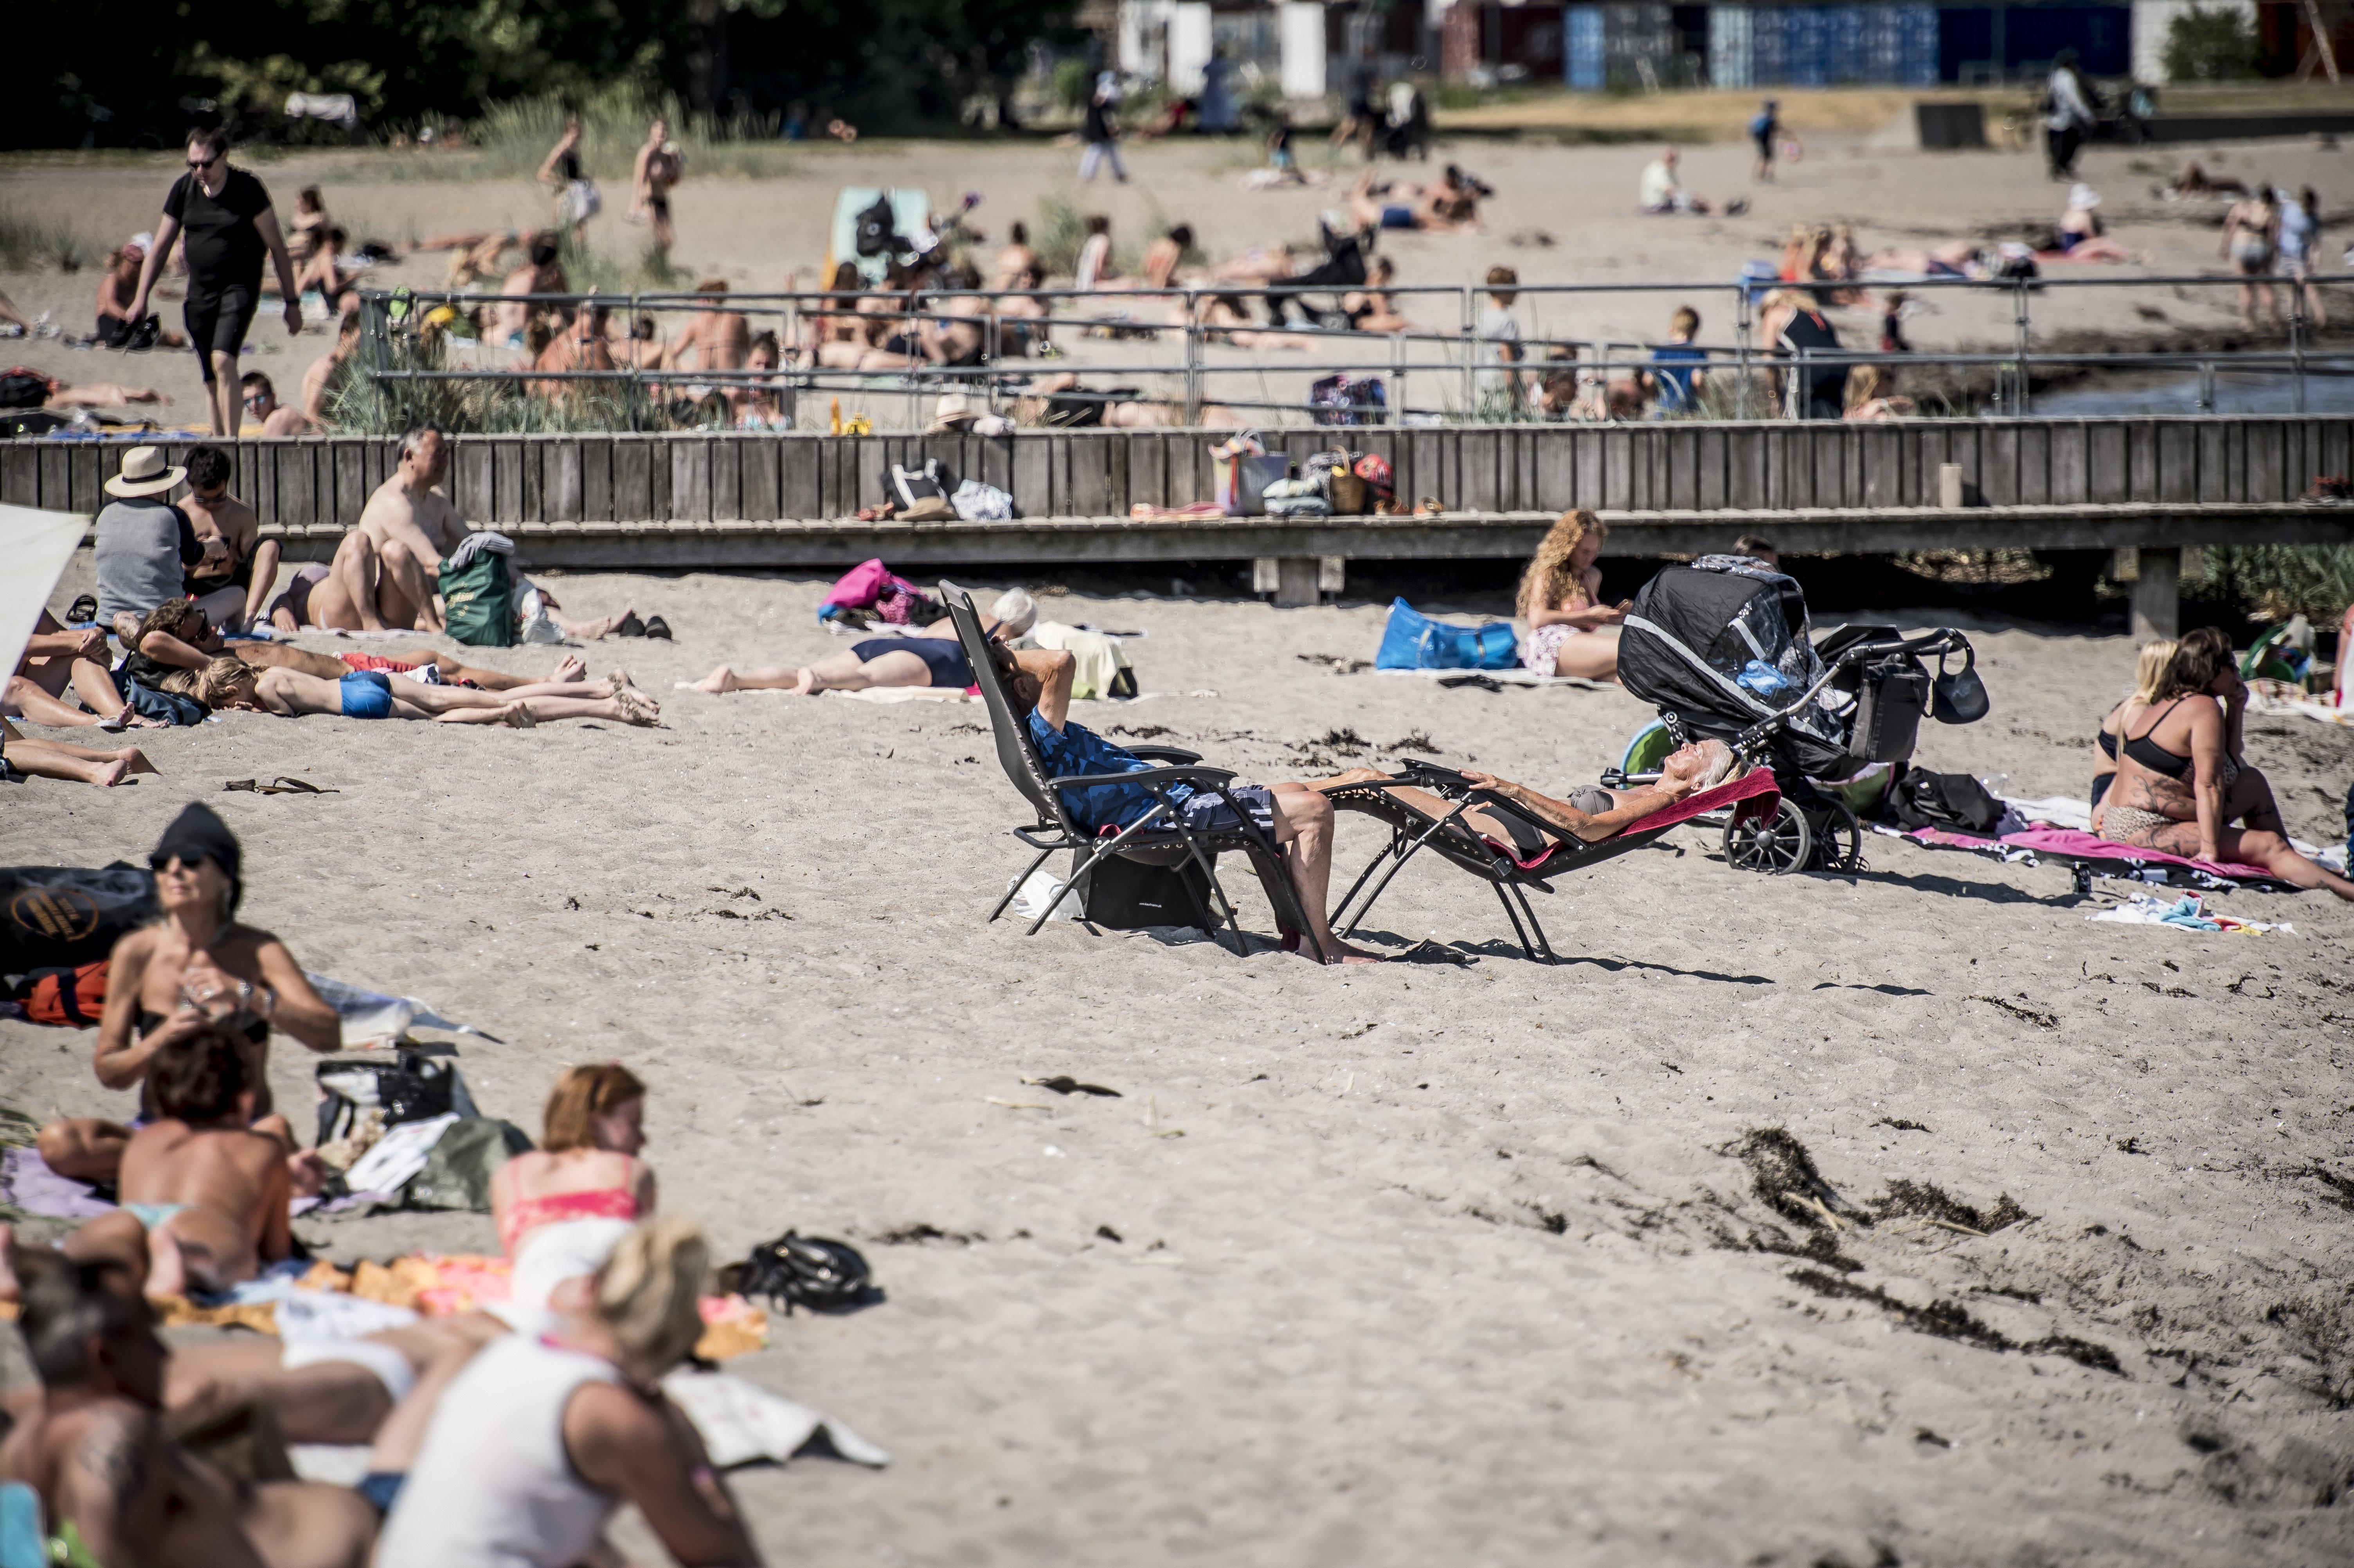 byens fitness tølløse massage escort nordsjælland